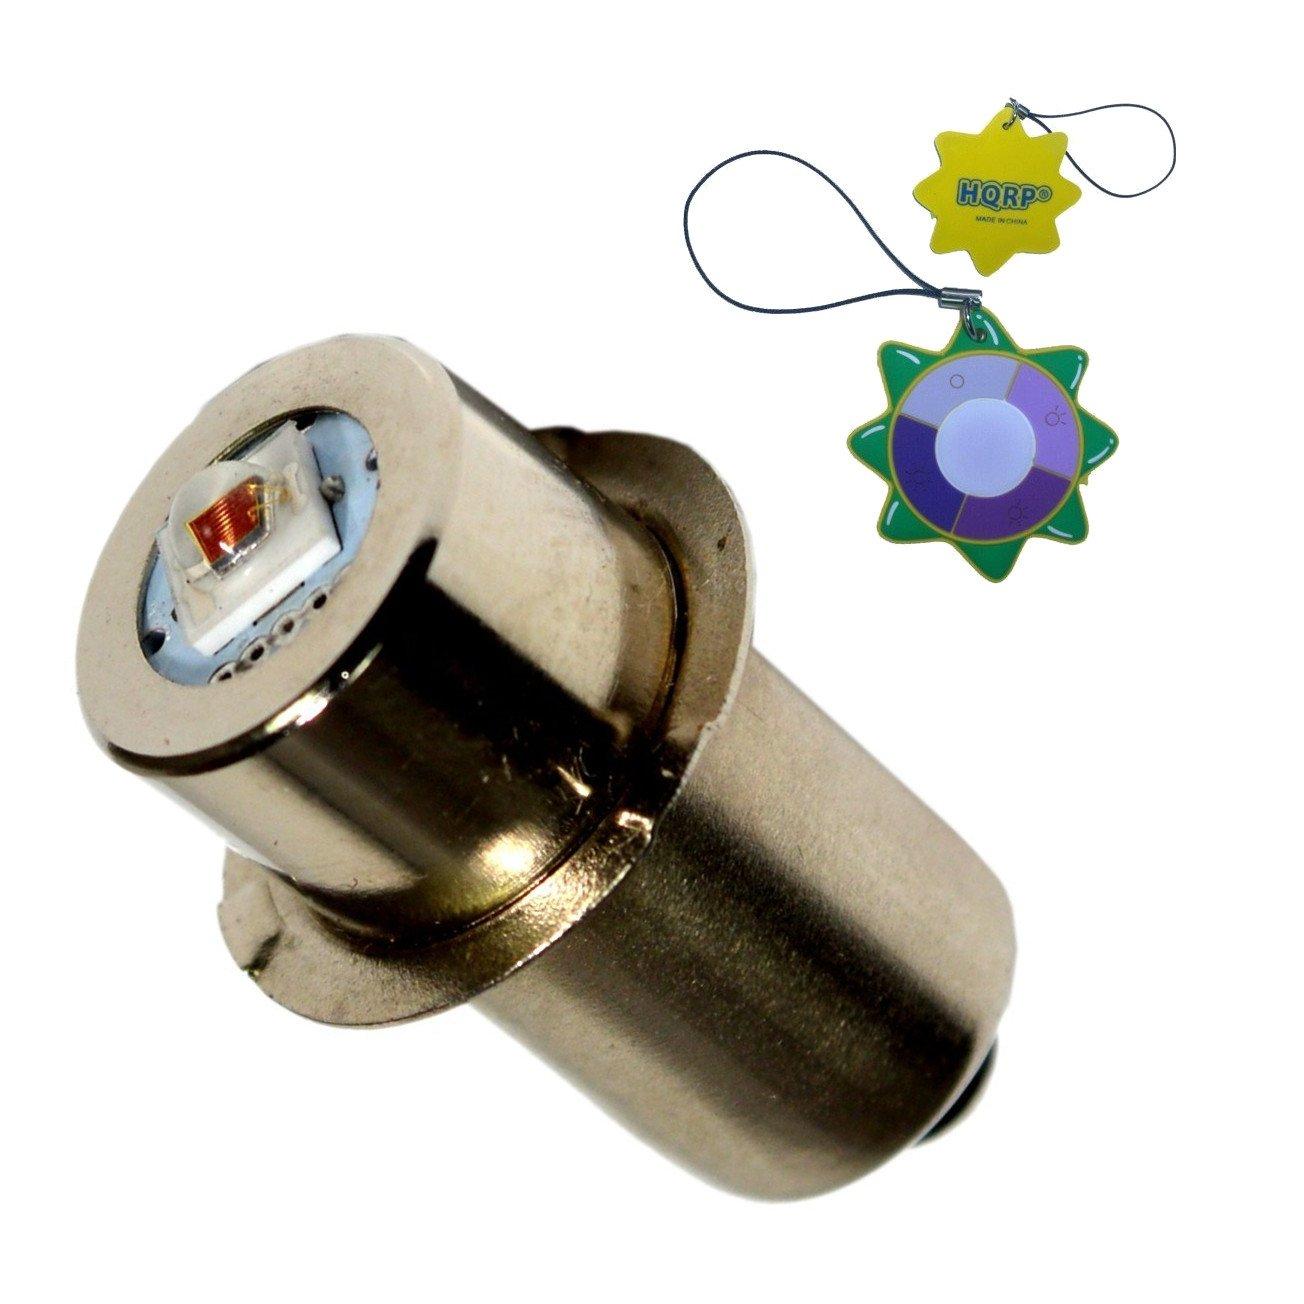 HQRP High Power Upgrade Bulb 3W LED RED Light Wavelength 625nm~635nm 7-30V for Dewalt: DW908 / DW919 / DW906 / DW918 / DW904 / DW902 / DW904 / DW9043 / DW9083 / DW9063 / DW9023 plus HQRP UV Meter